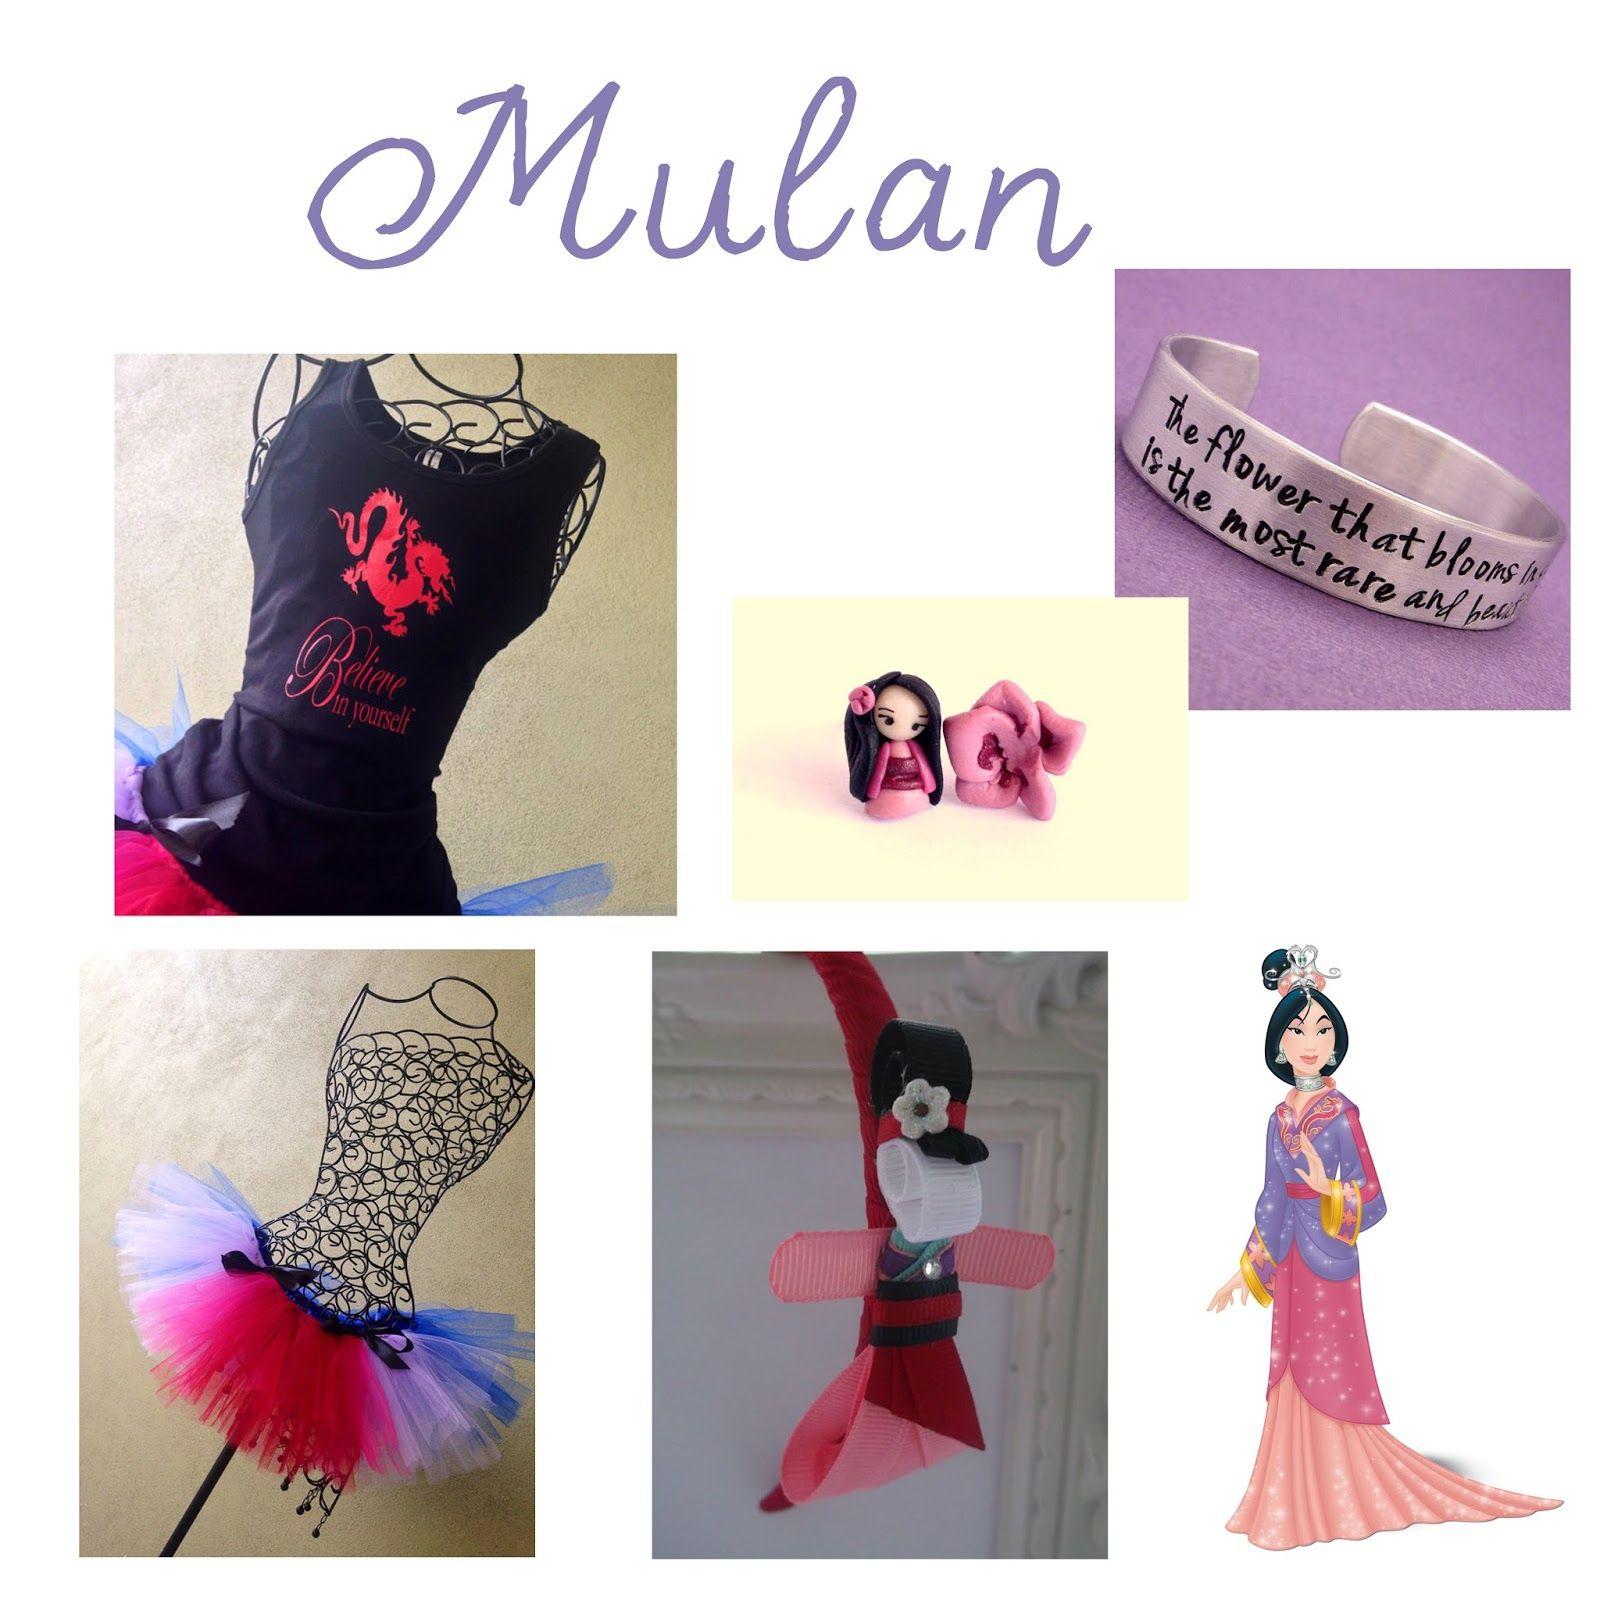 Run Disney Princess Mulan Costume Idea  sc 1 st  Pinterest & Run Disney Princess Mulan Costume Idea   BLOG: With Alabama Swagger ...